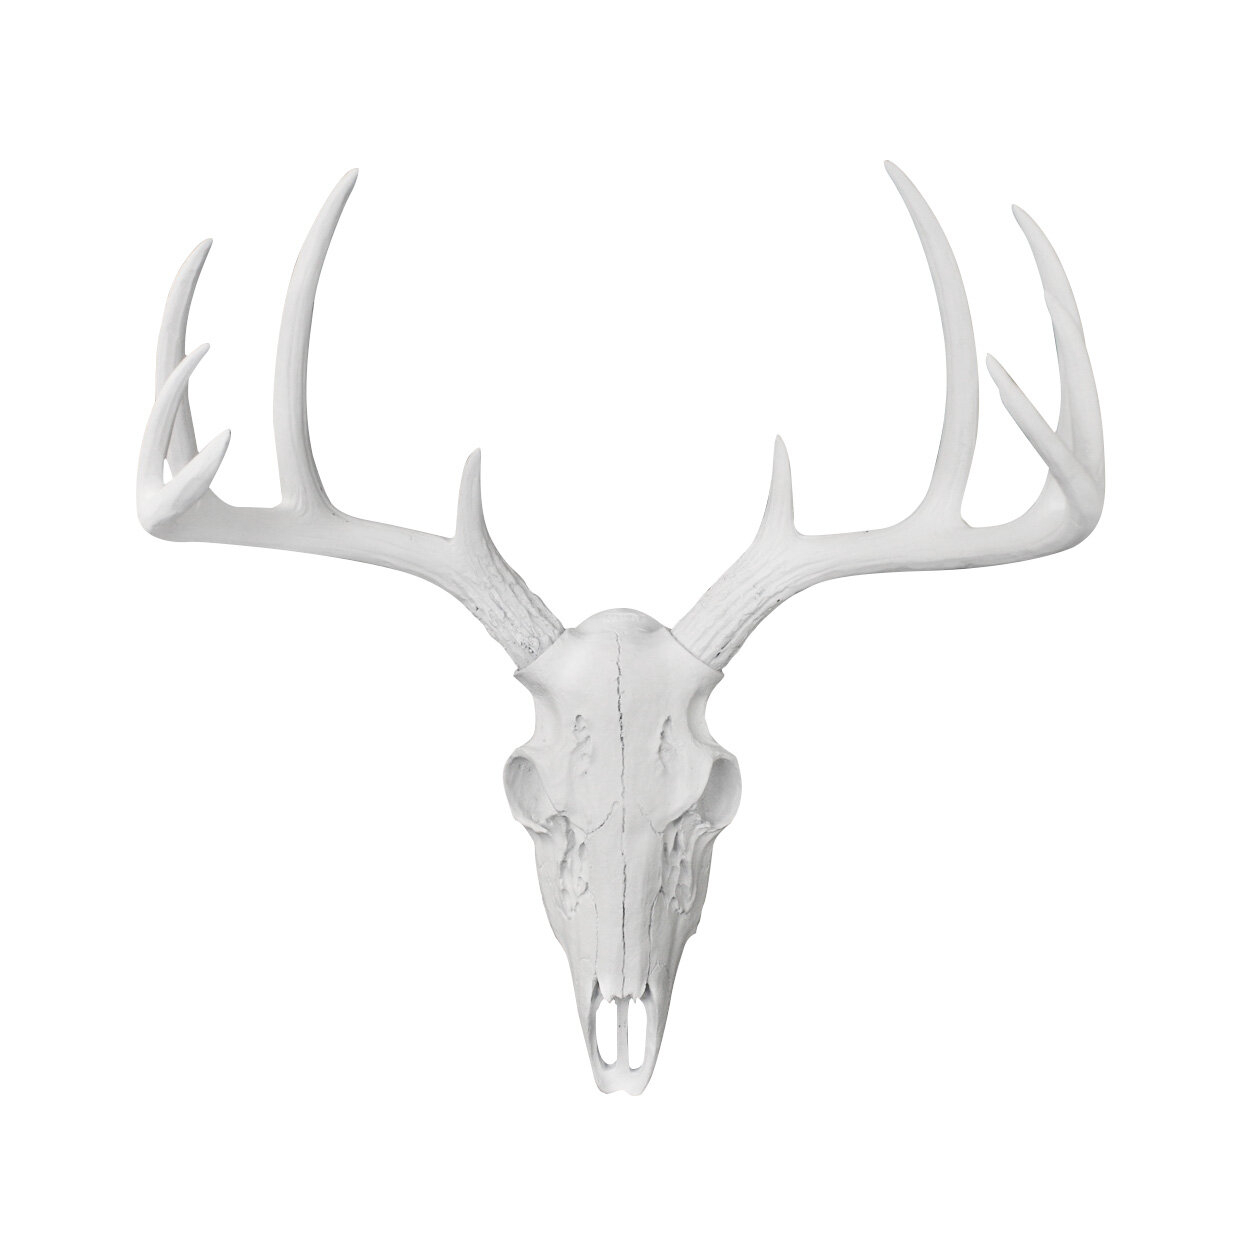 Mini Deer Head Skull Faux Taxidermy Wall Décor pertaining to Atlantis Faux Taxidermy Wall Decor (Image 18 of 30)